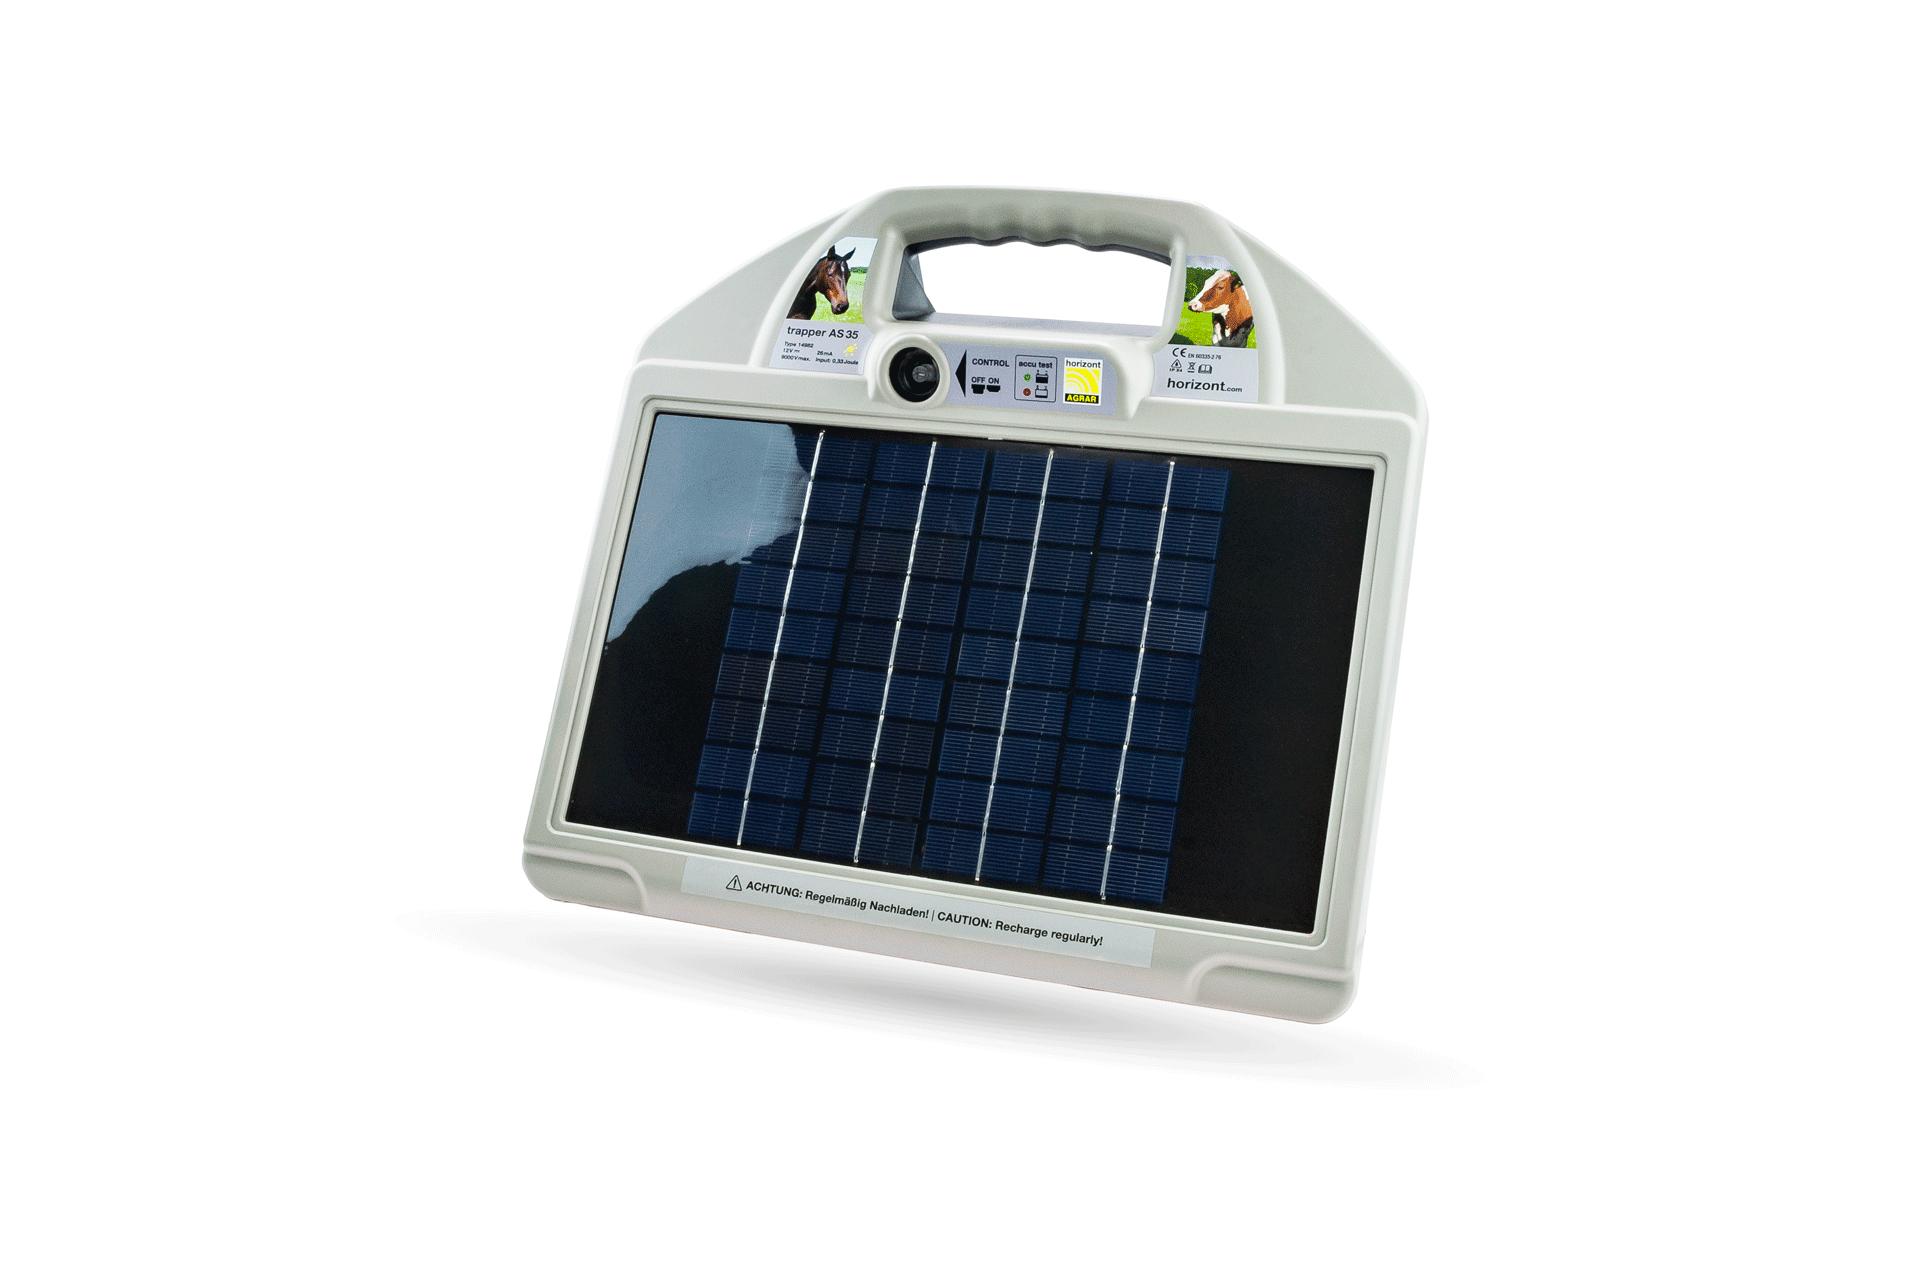 Trapper AS 35 Solargerät